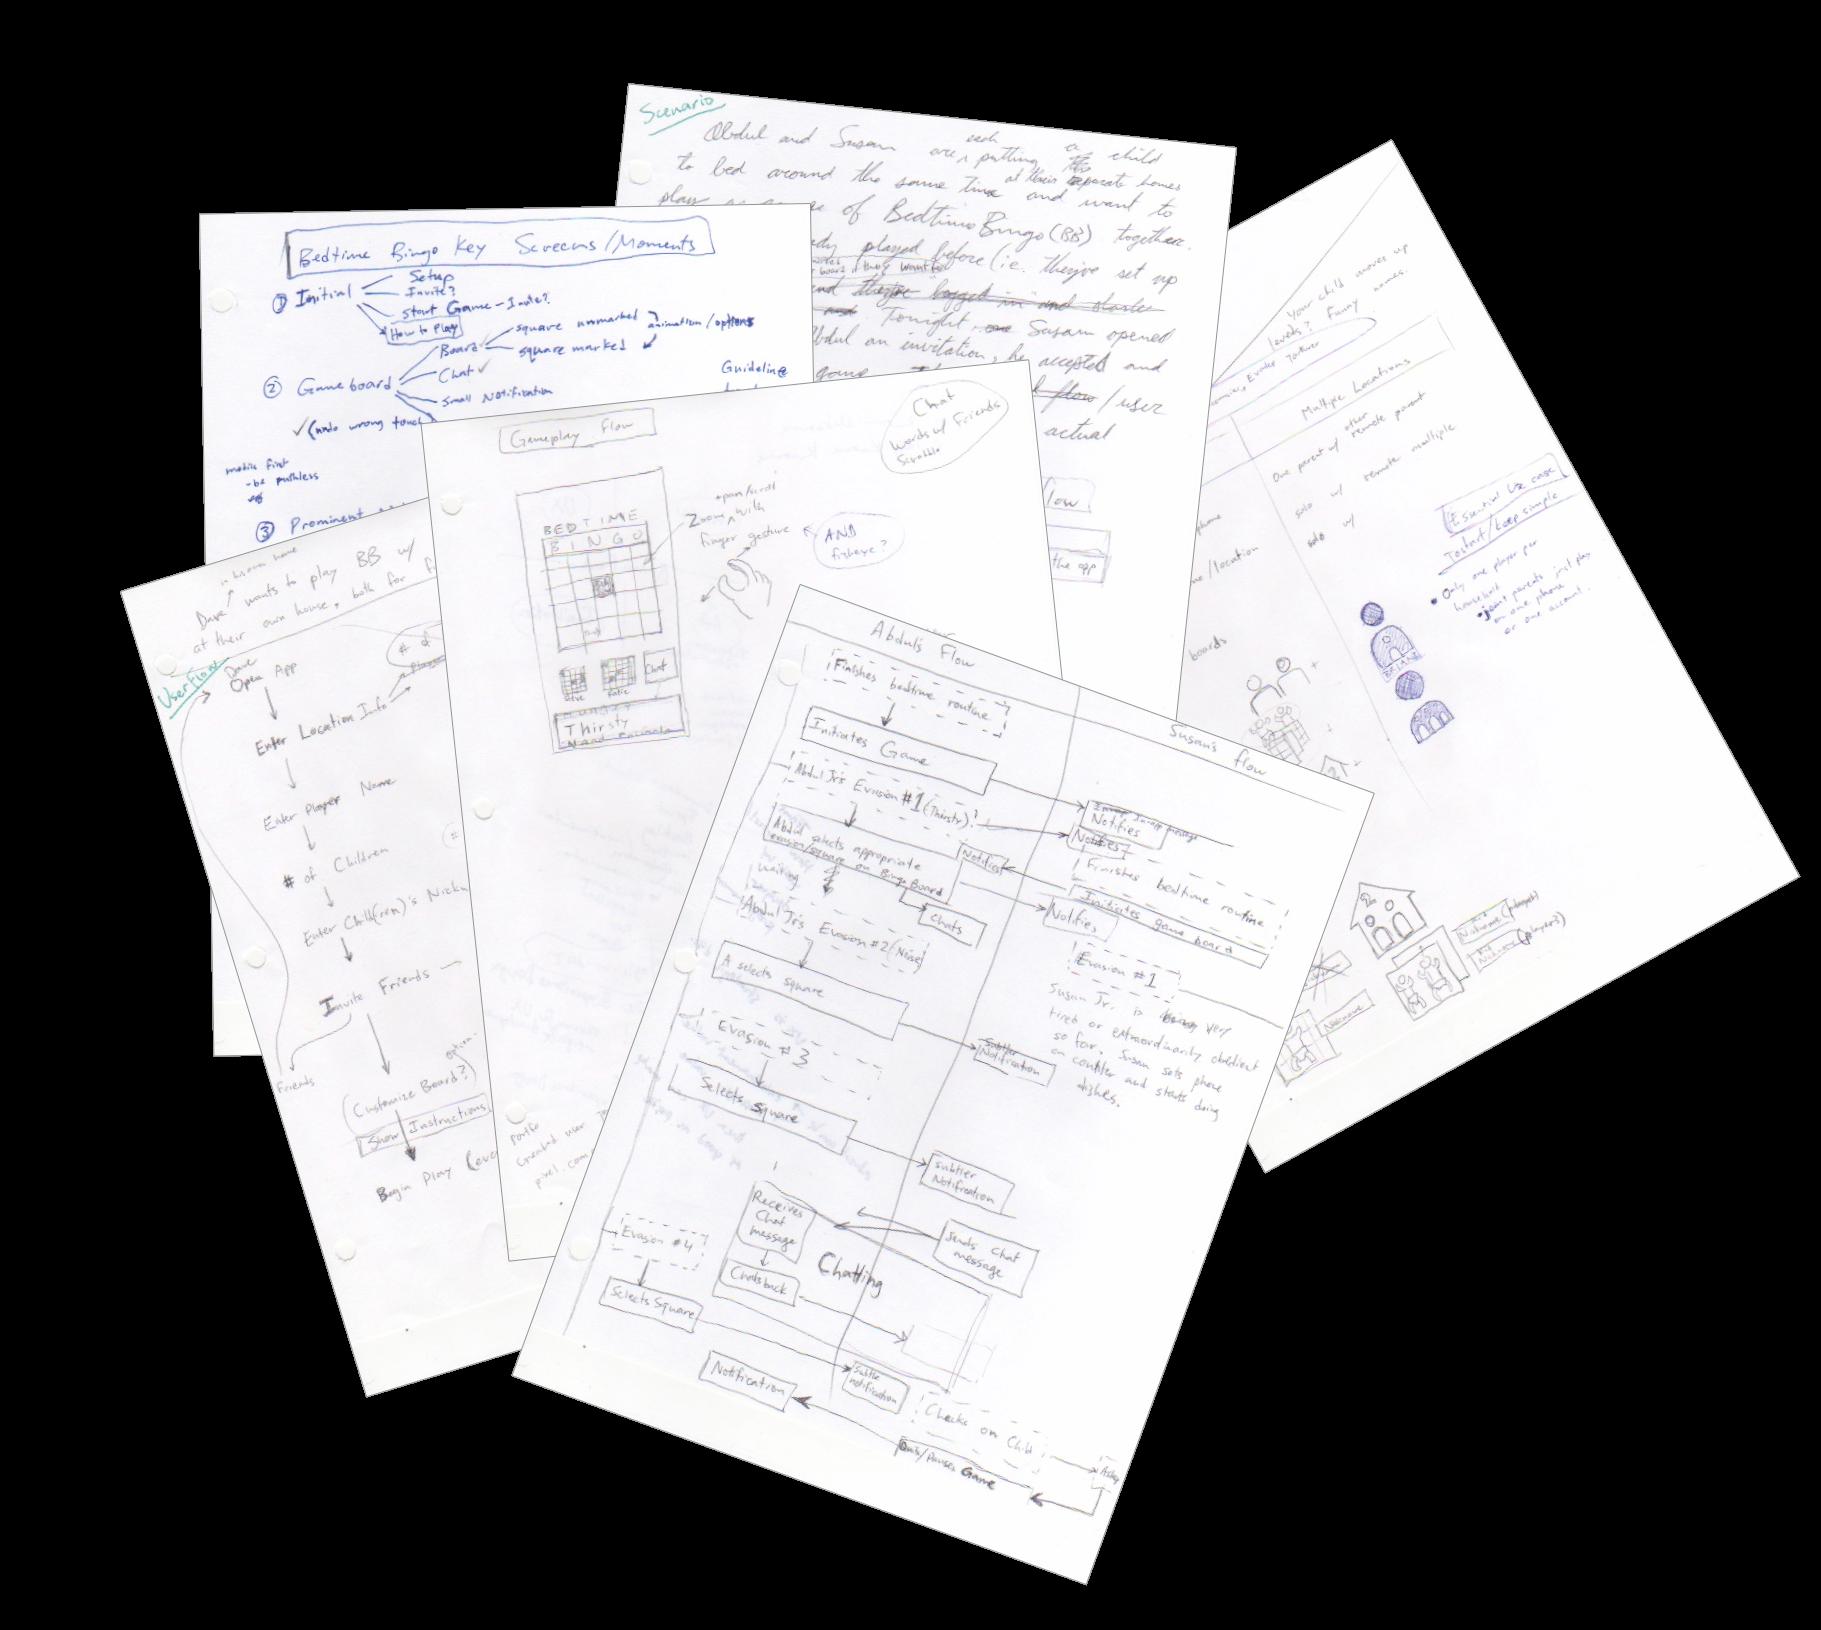 Process notes and sketches: scenarios, user flows, interaction design, icon thumbnails.